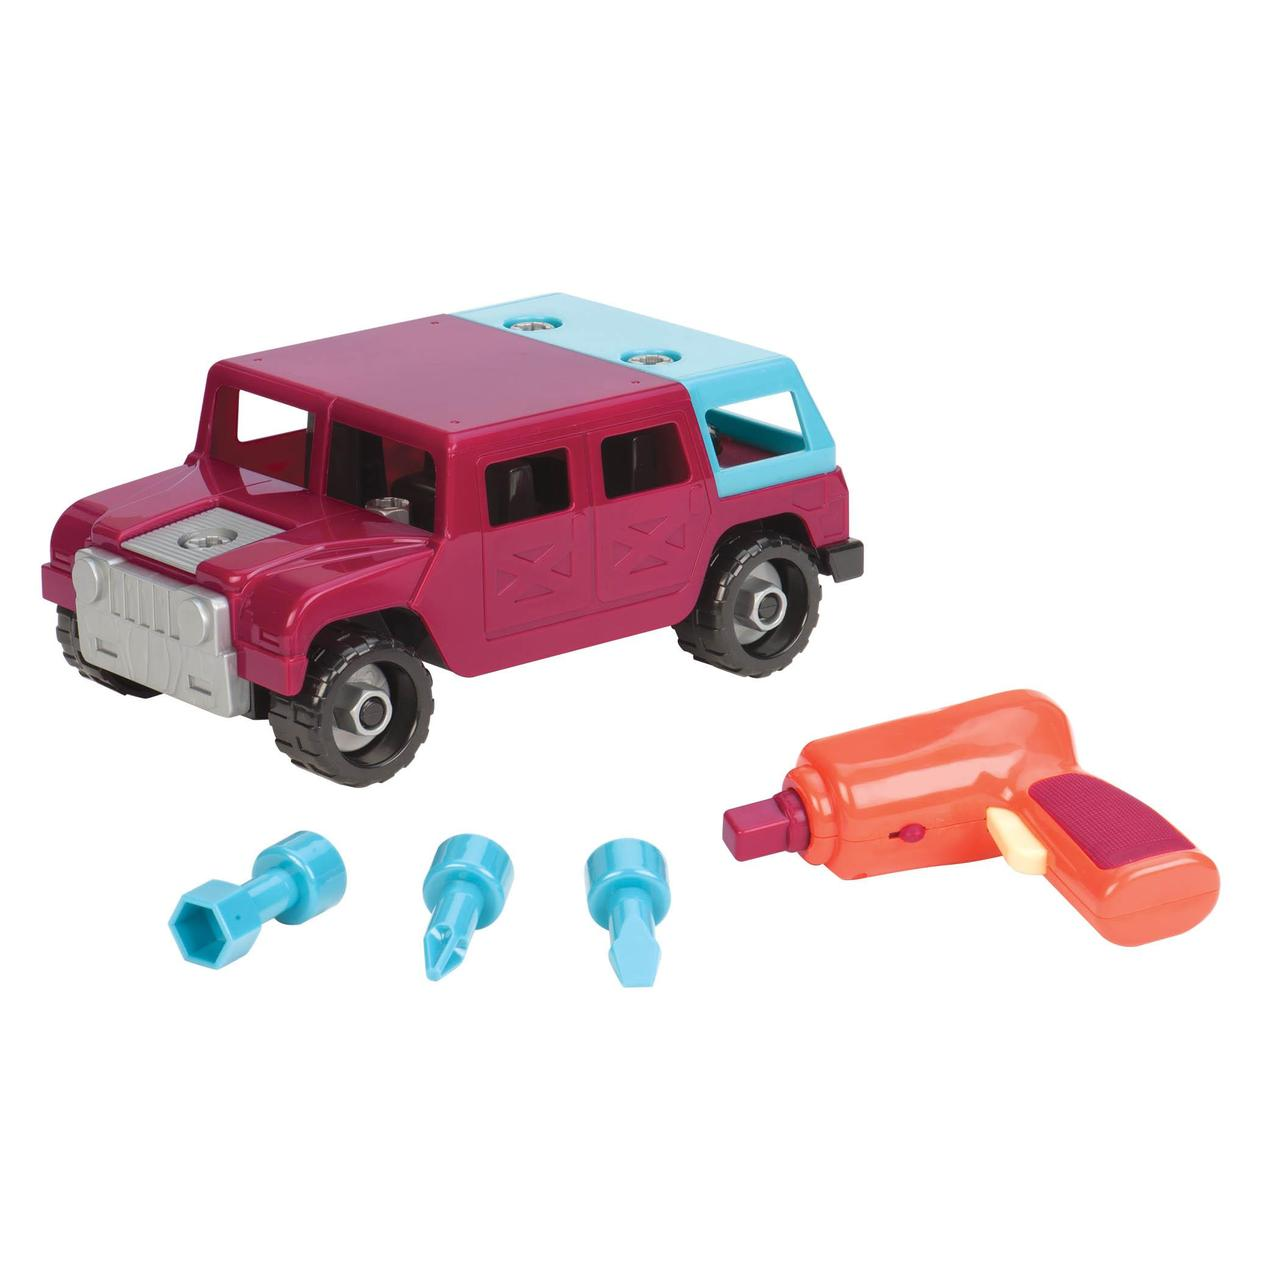 Battat Игрушка-конструктор разборной Армейский Грузовик Take-Apart Truck Car 4x4 Jeep